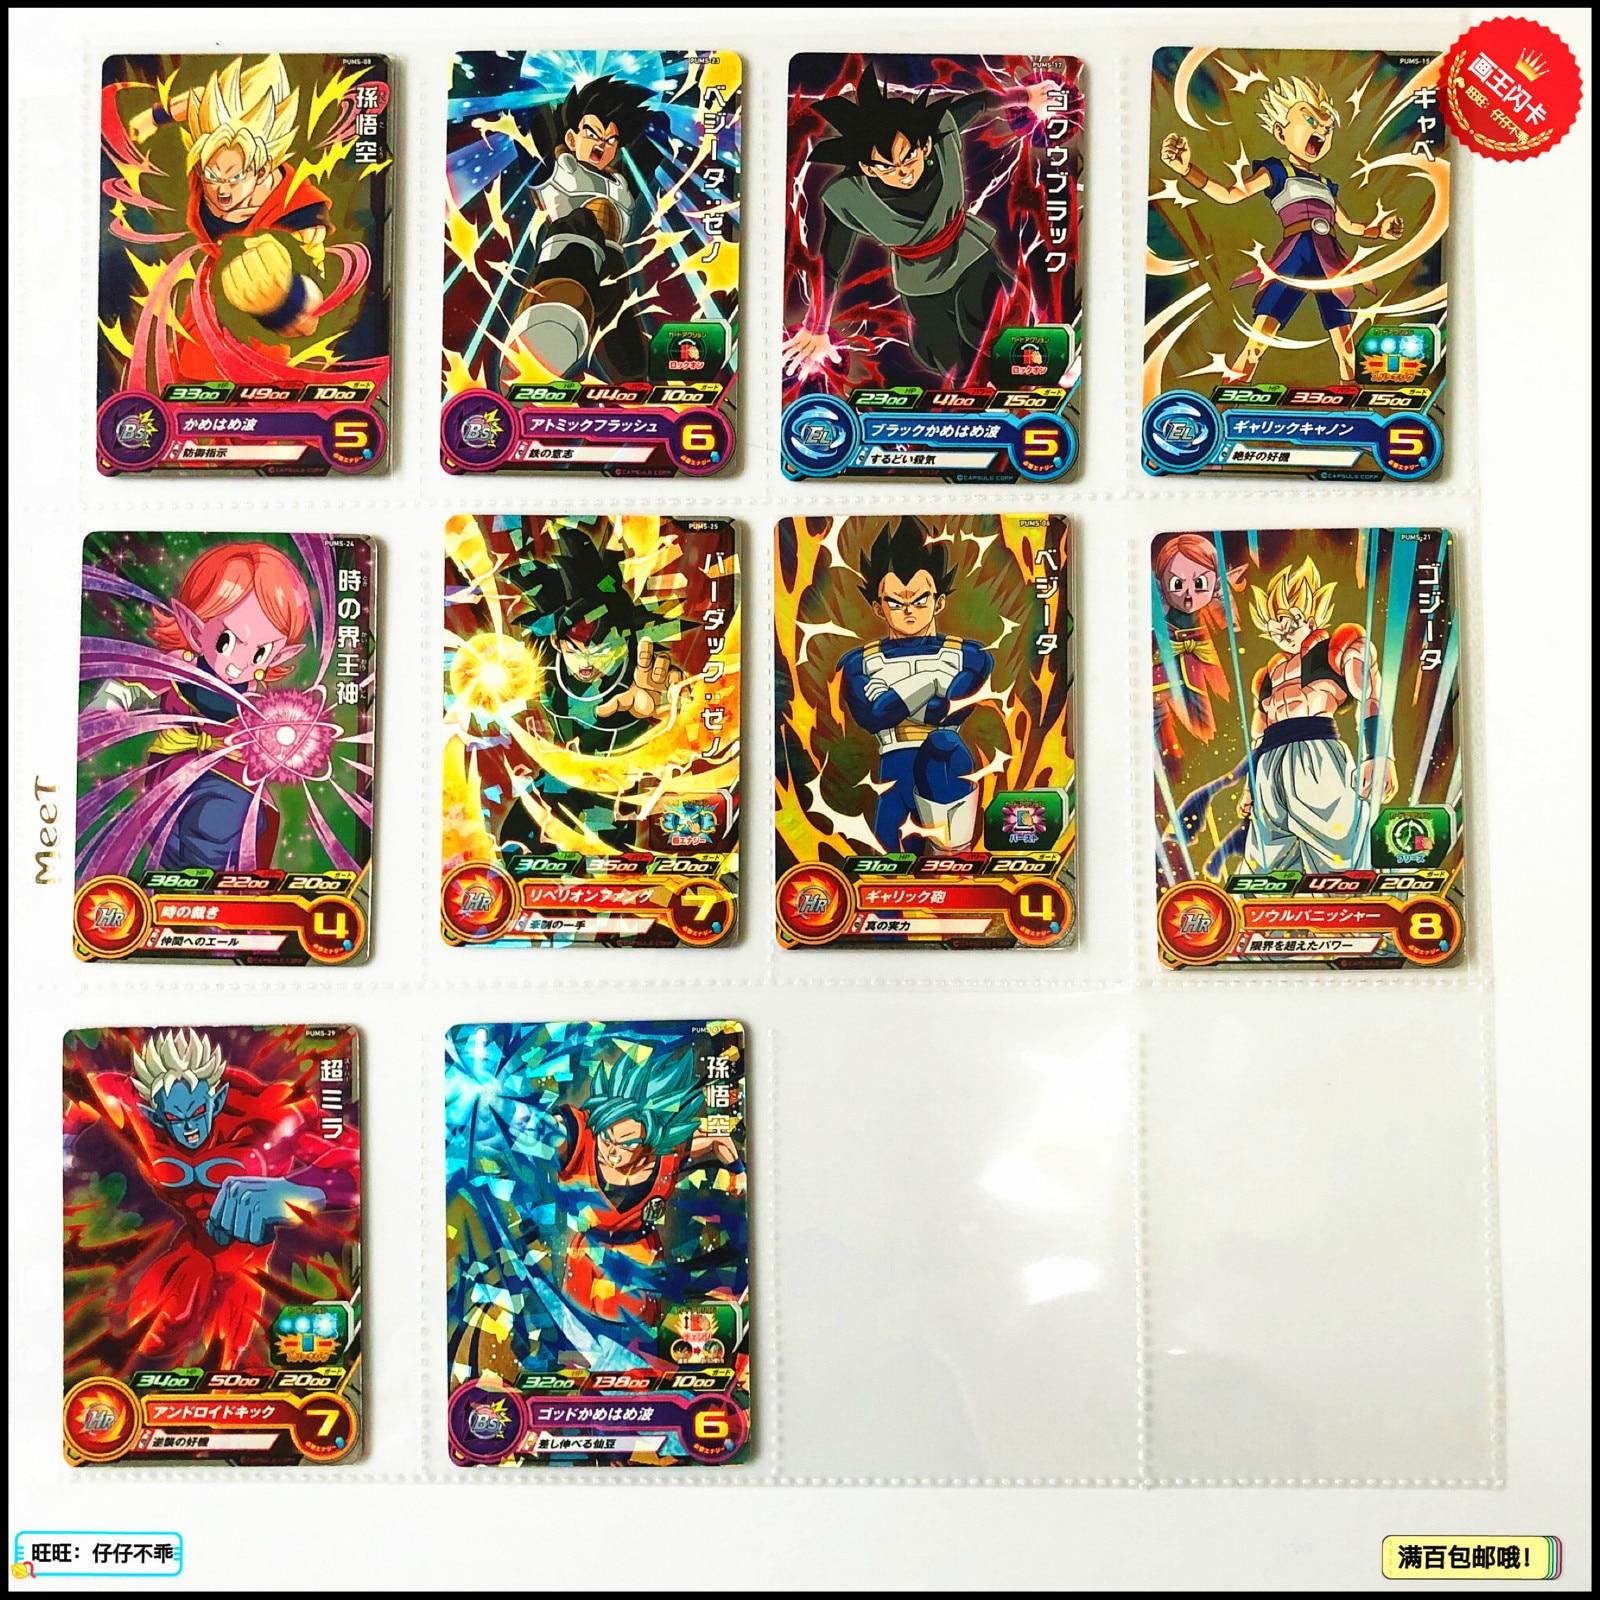 Japan Original Dragon Ball Hero PUMS Broli God Super Saiyan Goku Toys Hobbies Collectibles Game Collection Anime Cards